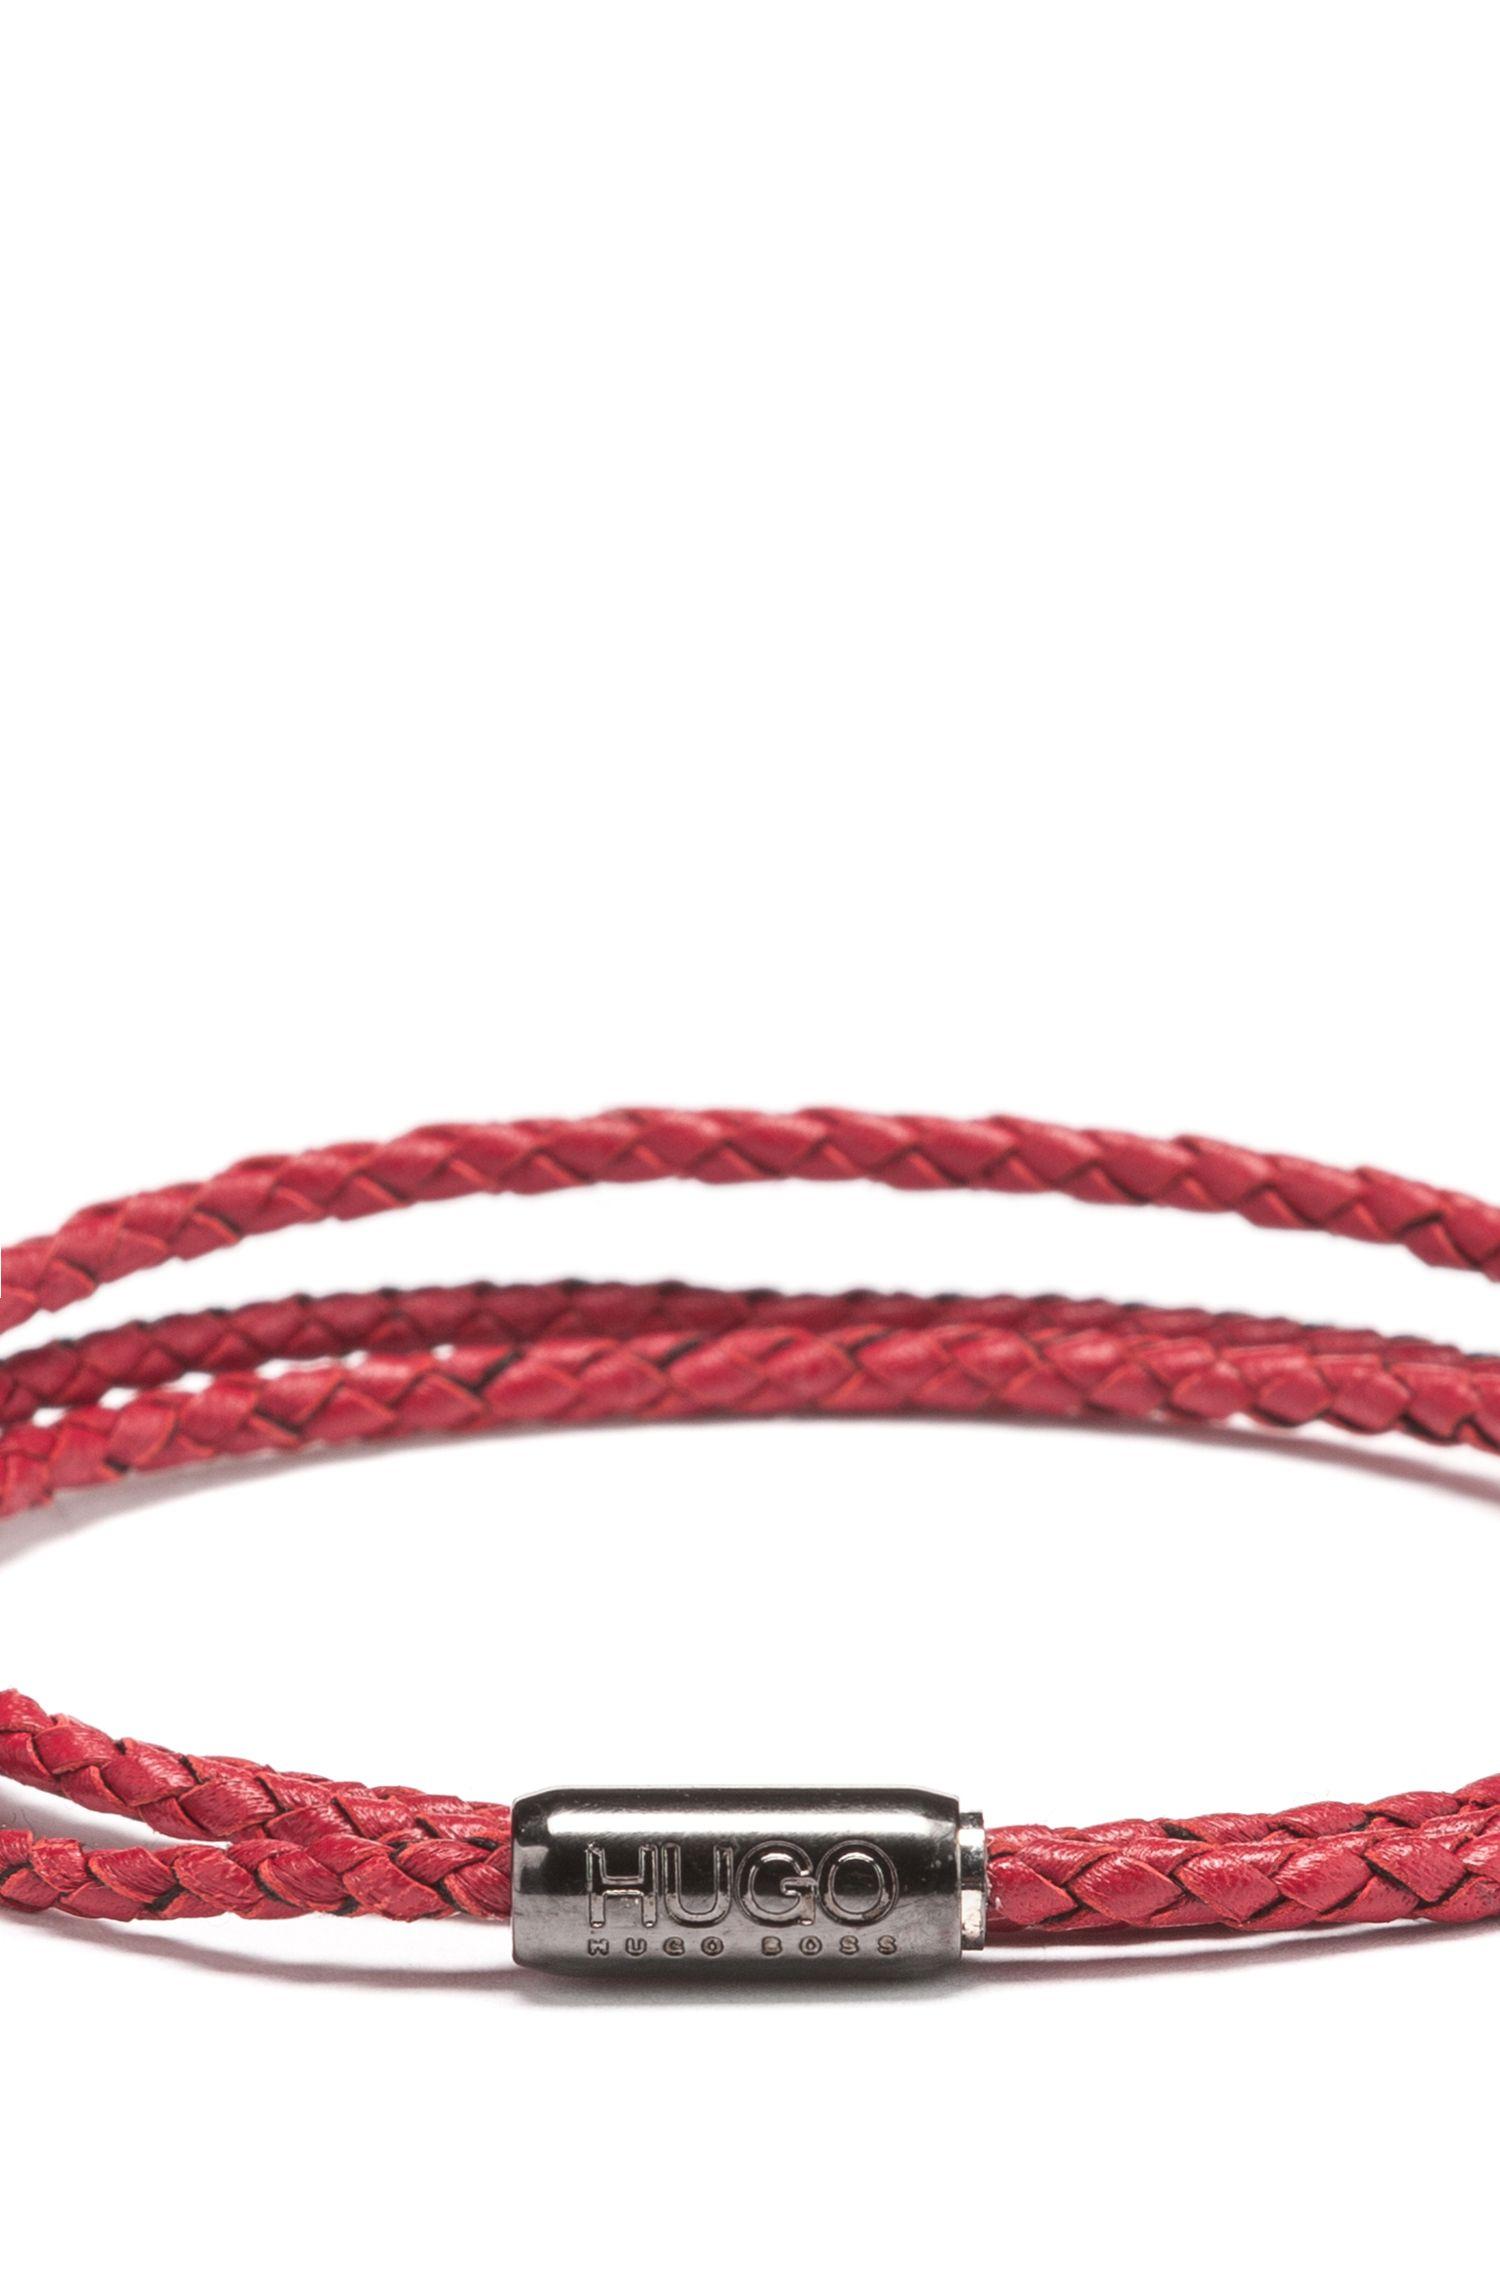 Hugo Boss - Geflochtenes Wickelarmband aus italienischem Leder - 3